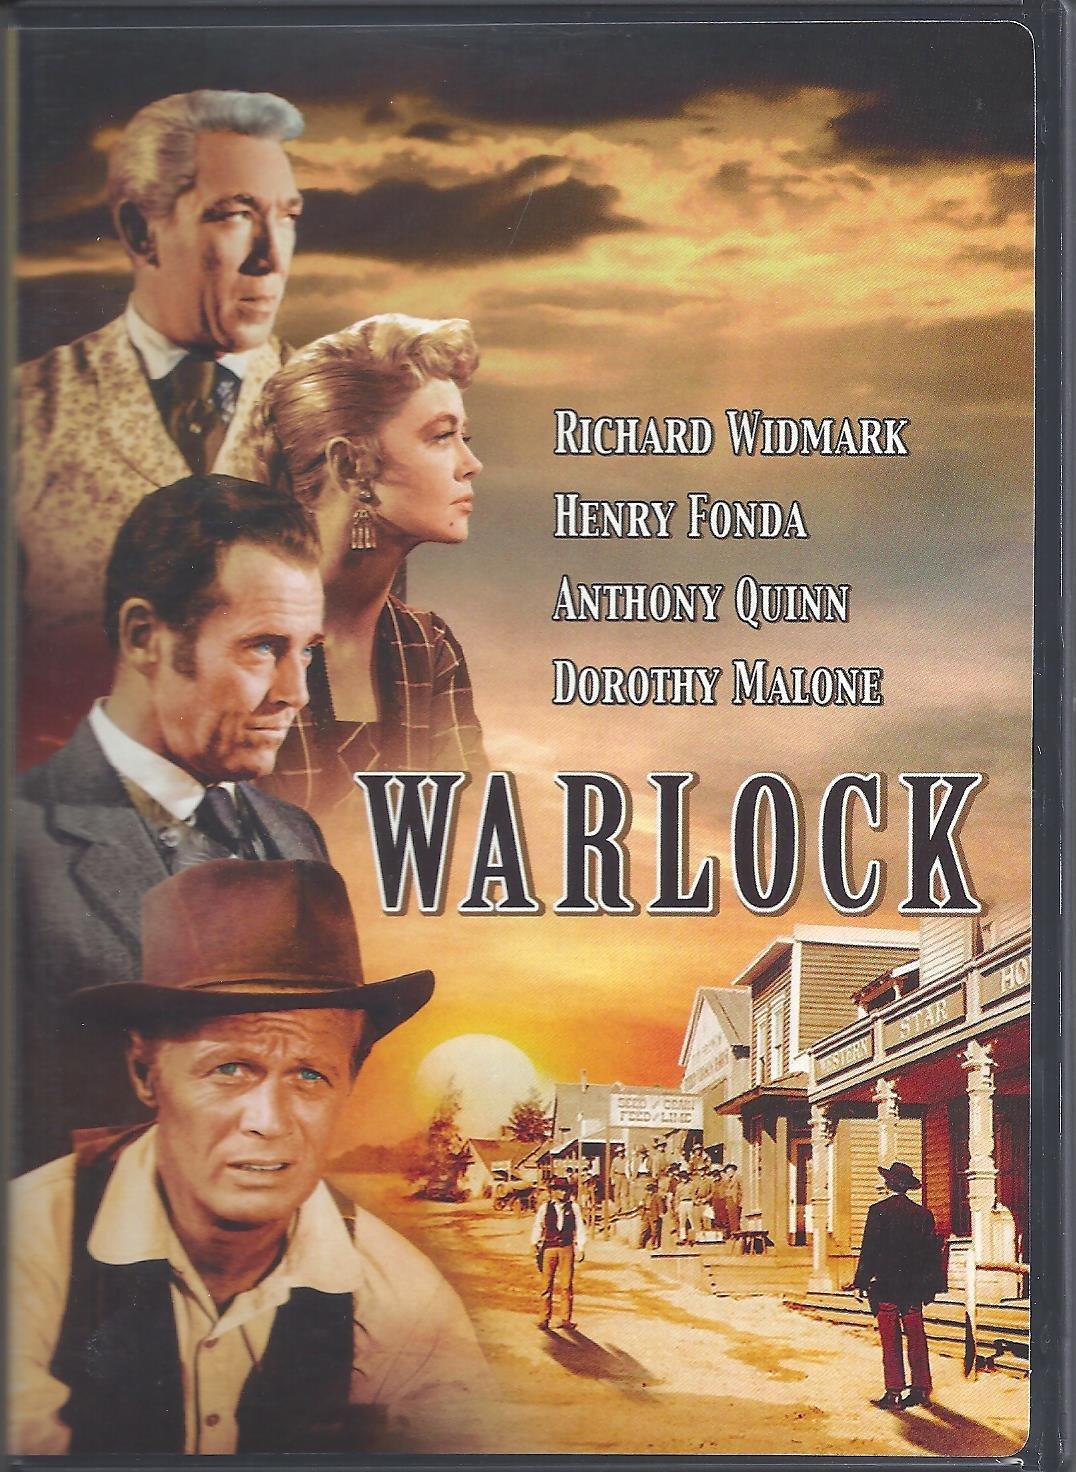 Amazoncom Warlock Richard Widmark Henry Fonda Anthony Quinn